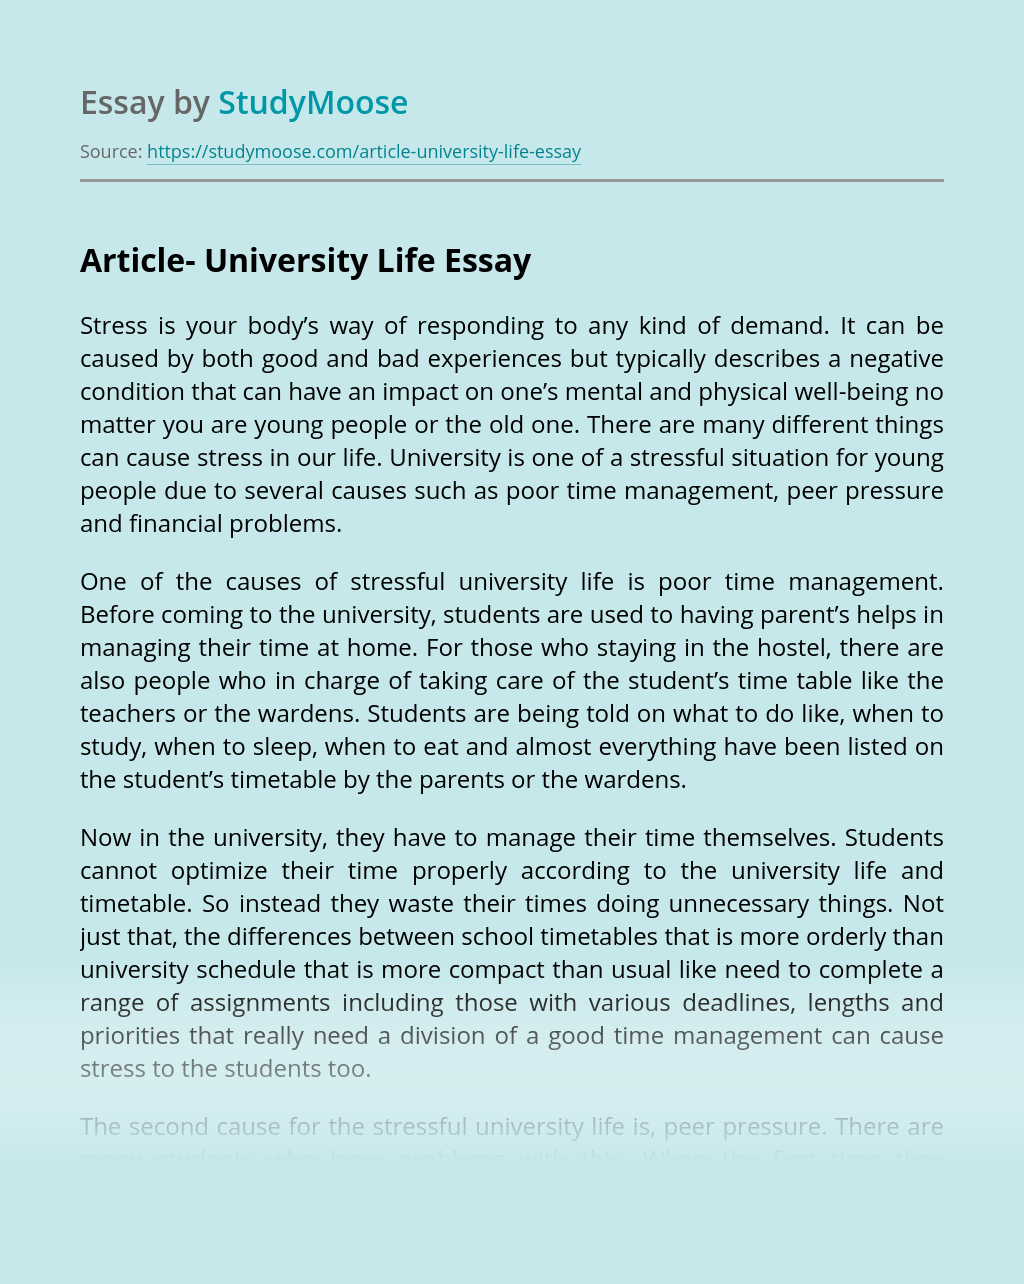 Article- University Life